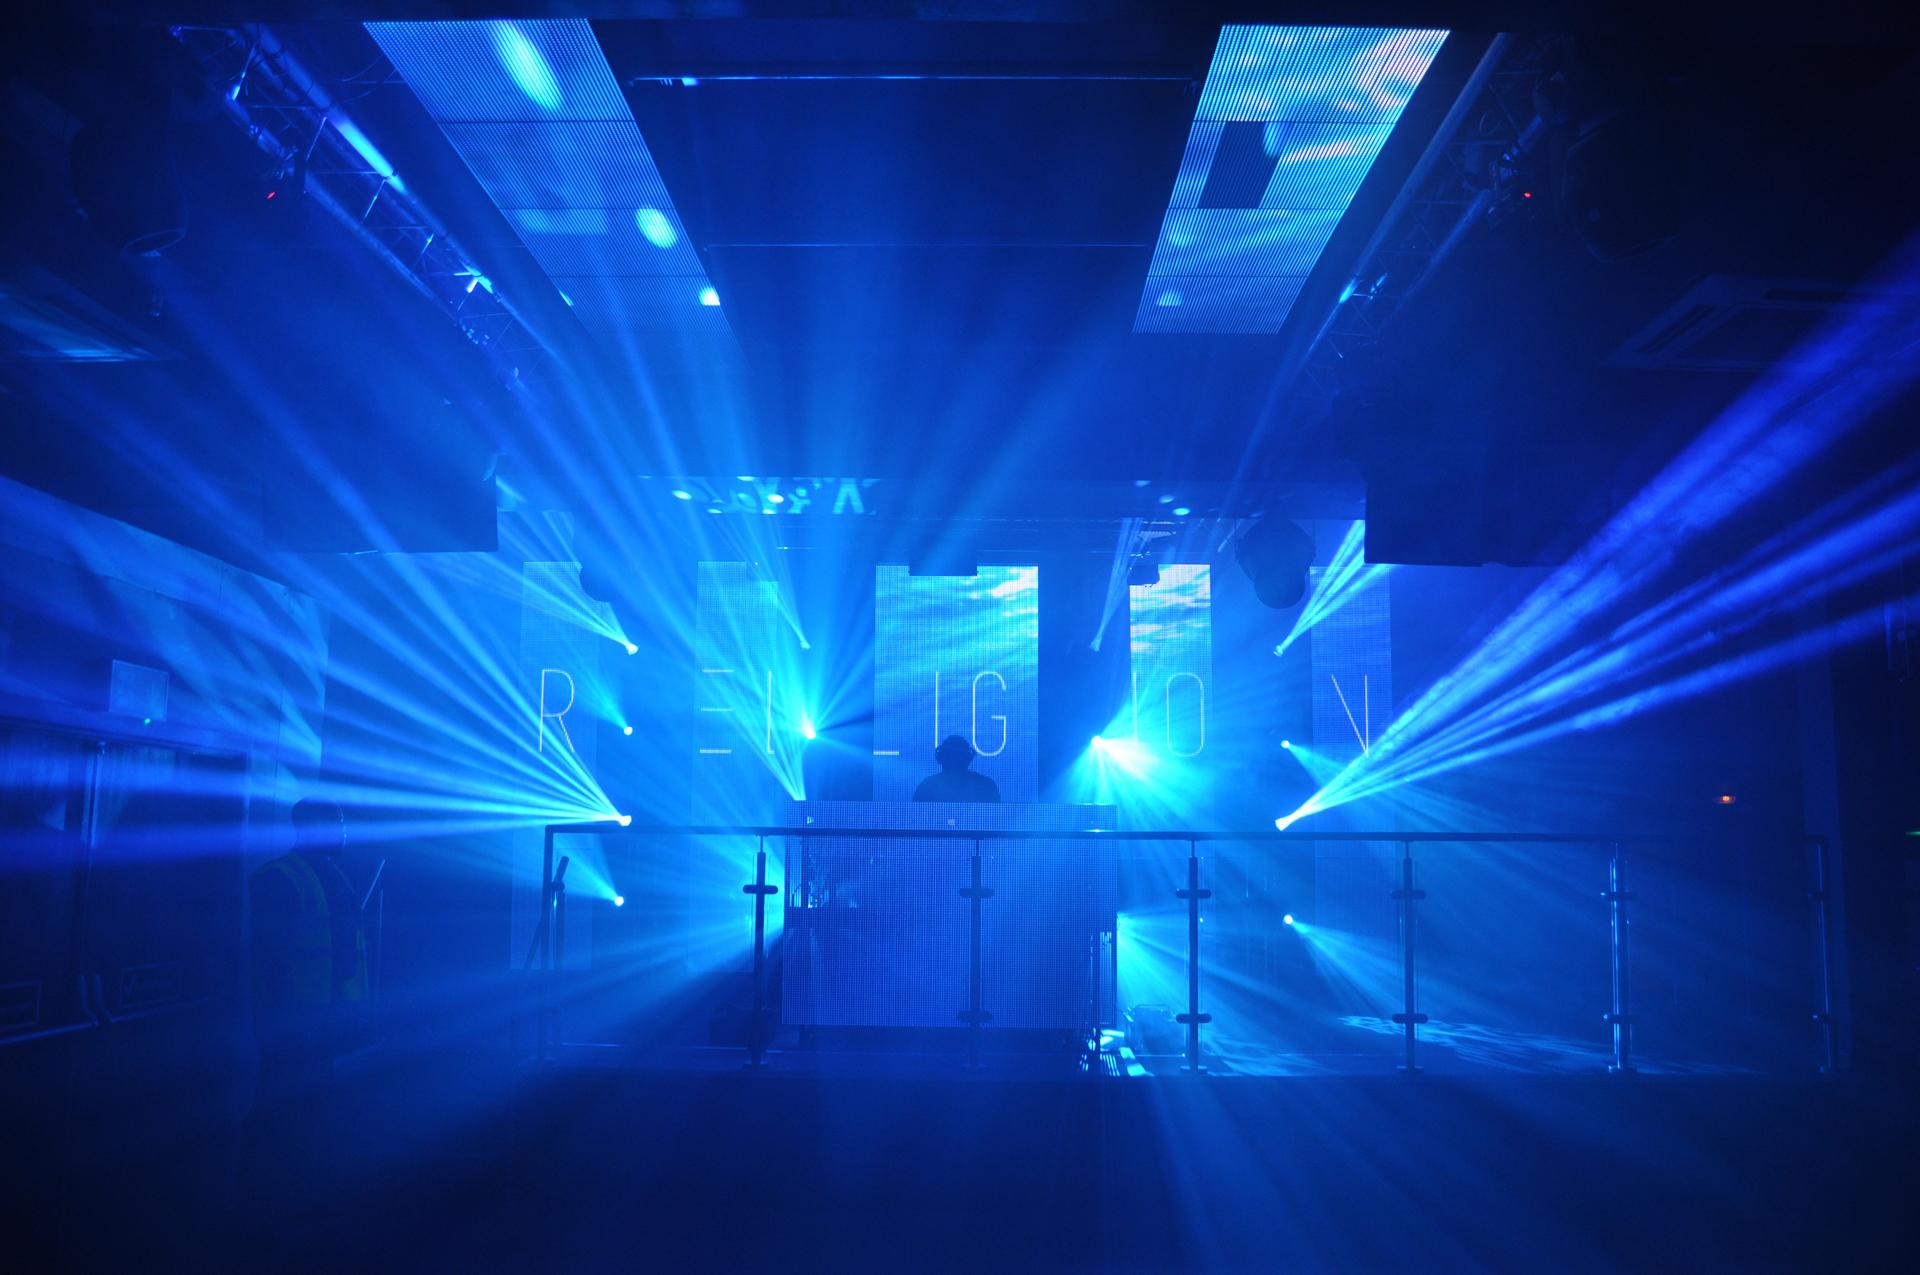 Nightclub LED Video Screen